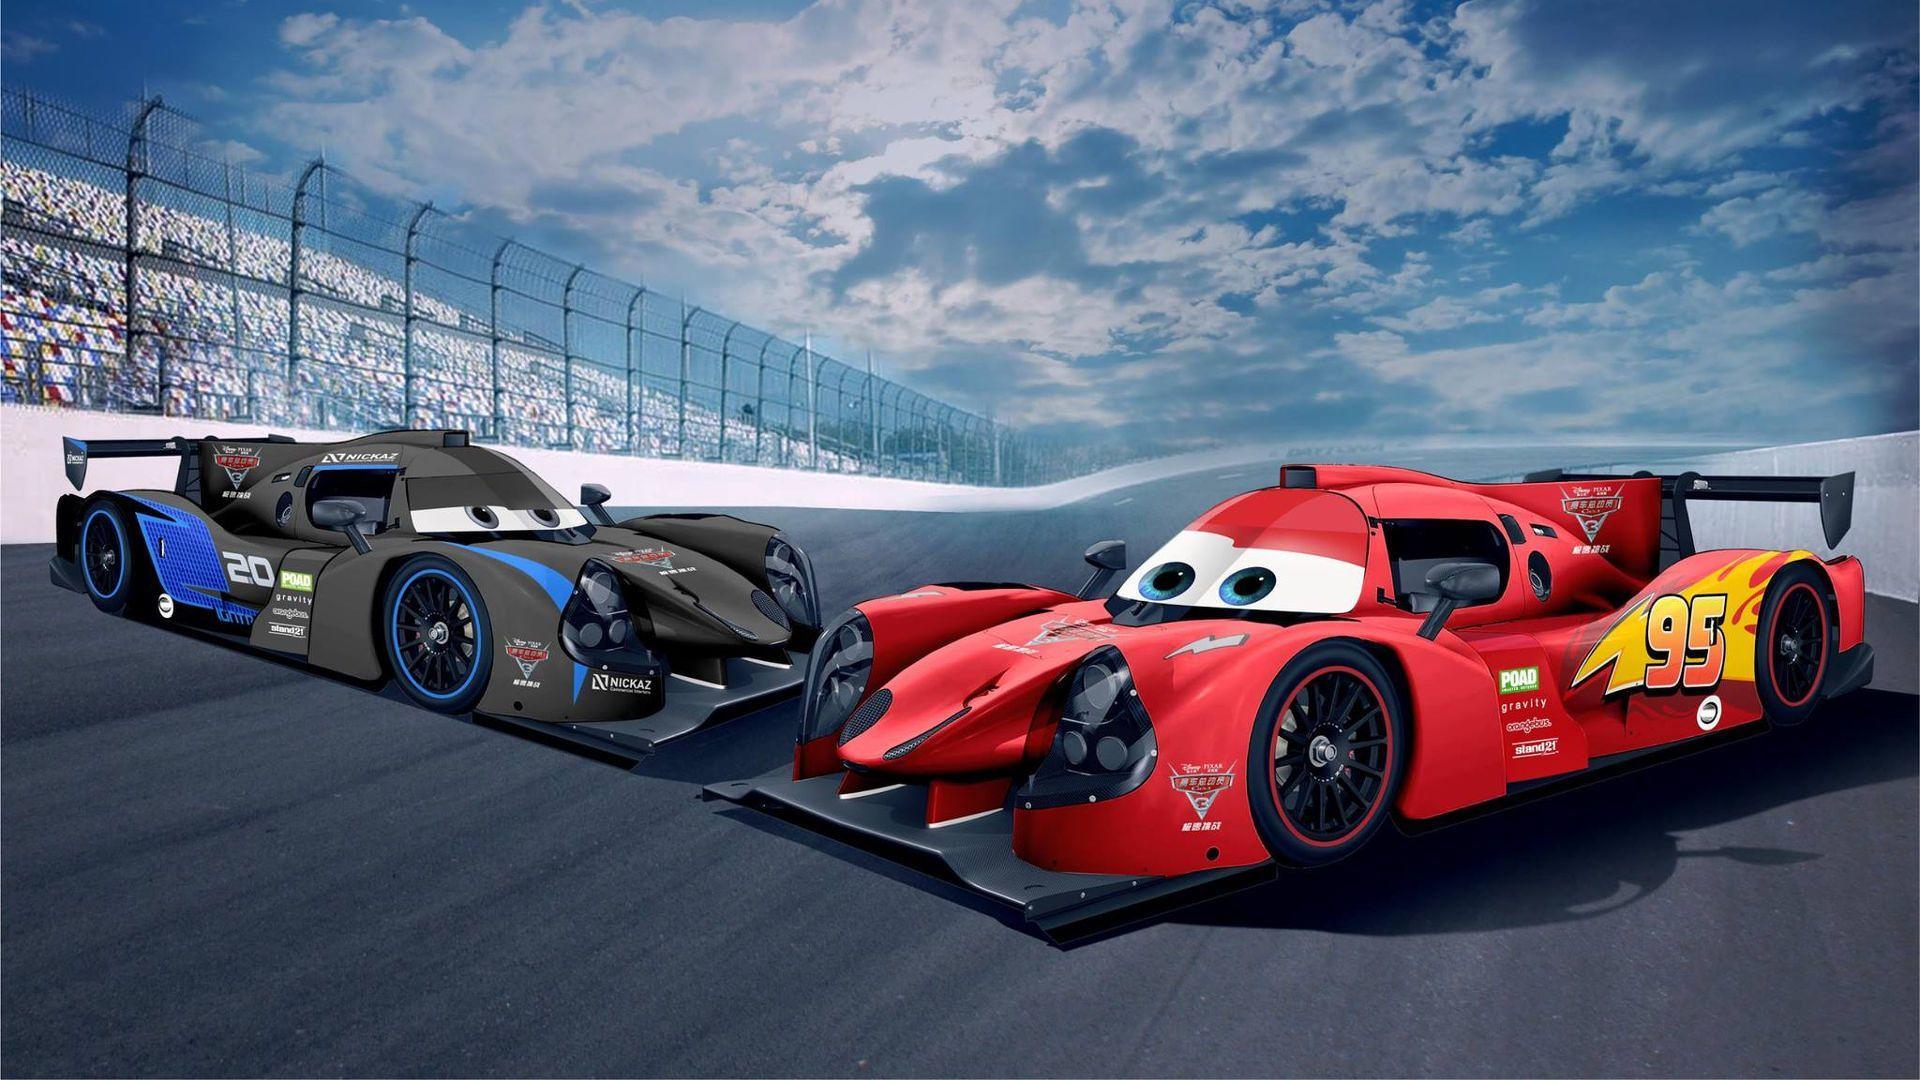 LMP3 Race Cars Get Lightning McQueen, Jackson Storm Liveries